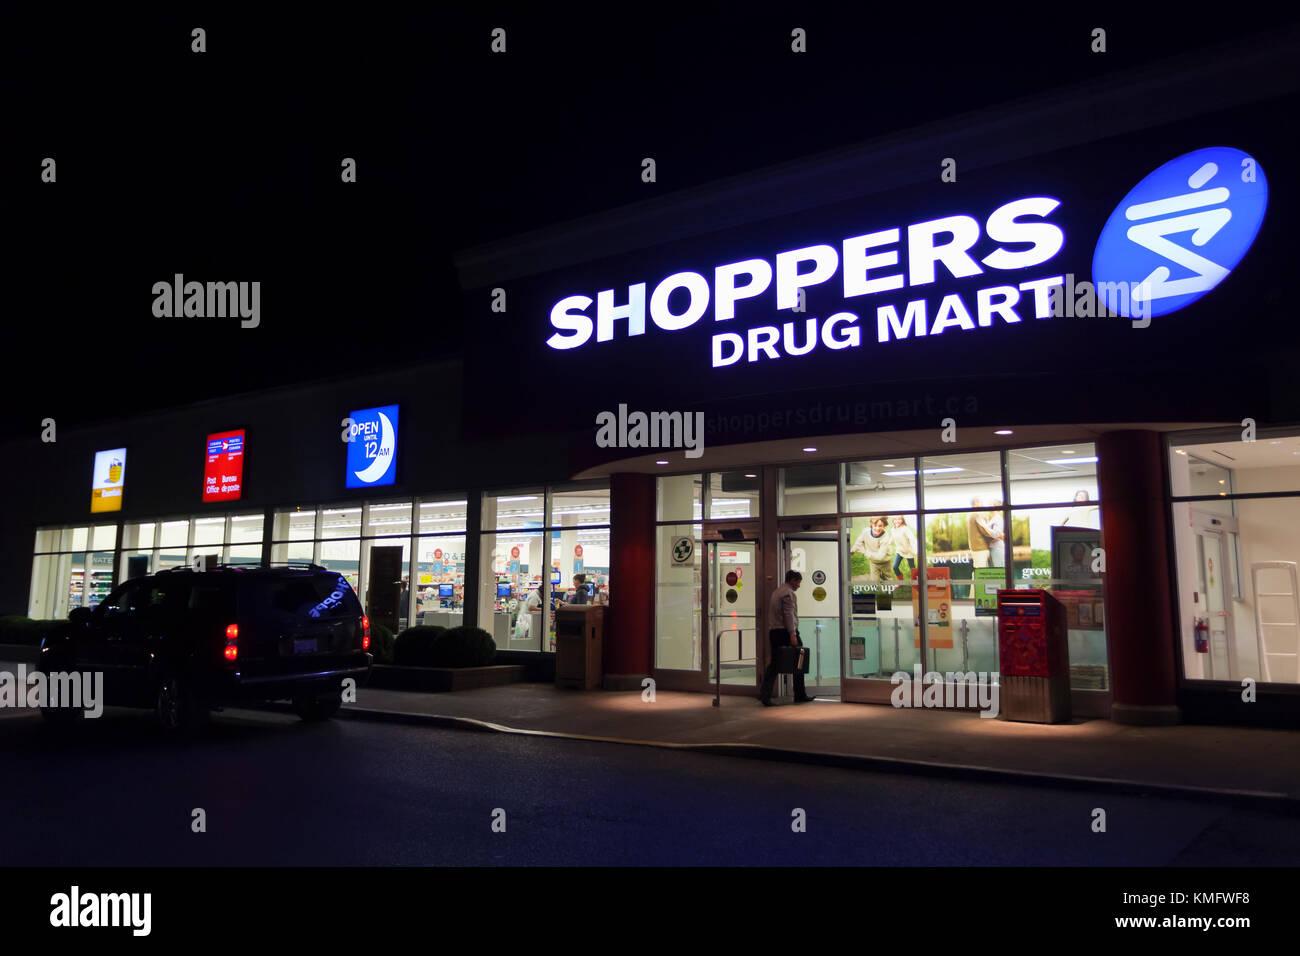 Toronto, Canada - Oct 19, 2017: Shoppers Drug Mart store in the city of Toronto illuminated at night Stock Photo